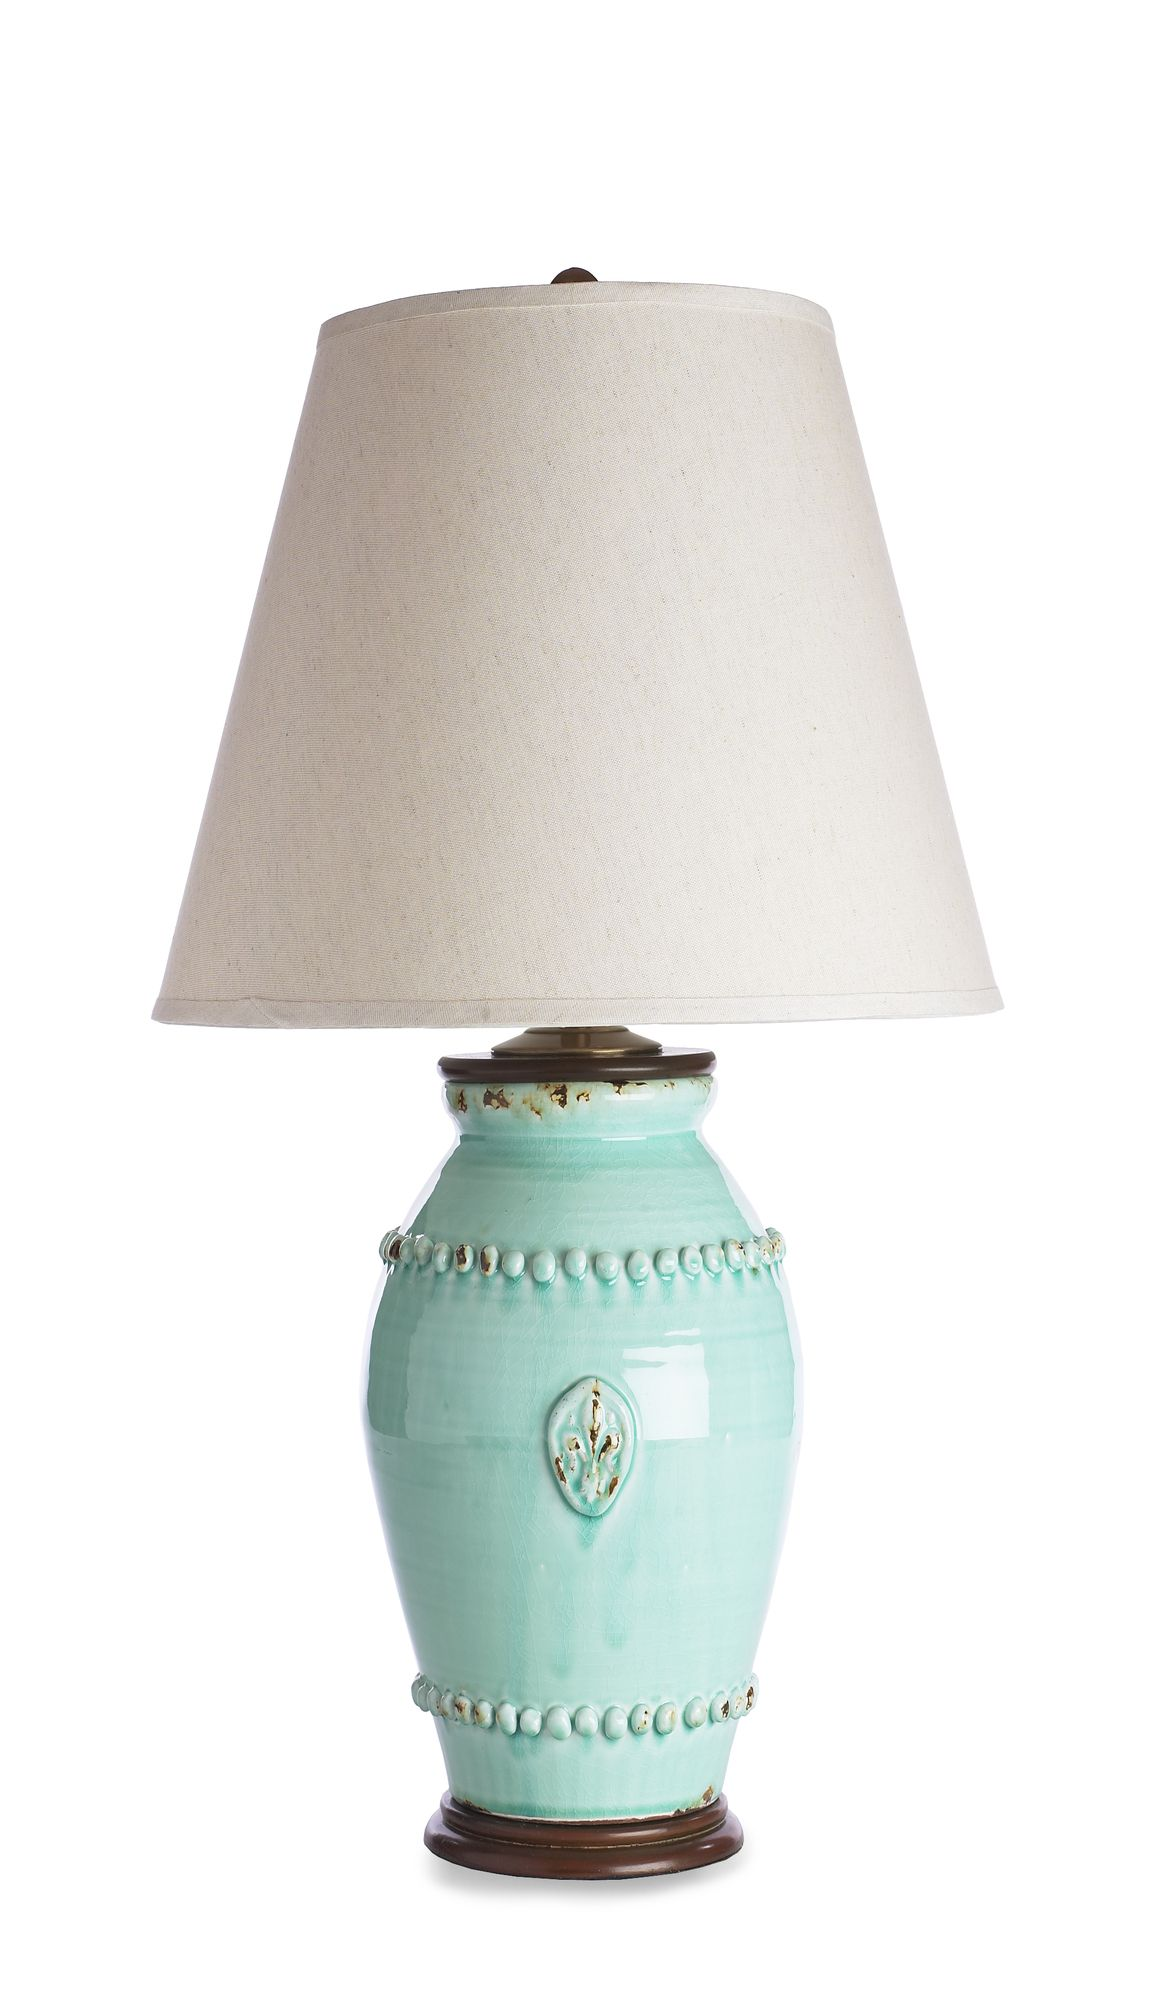 For the living room? has a fleur de lis! | Home sweet home ...